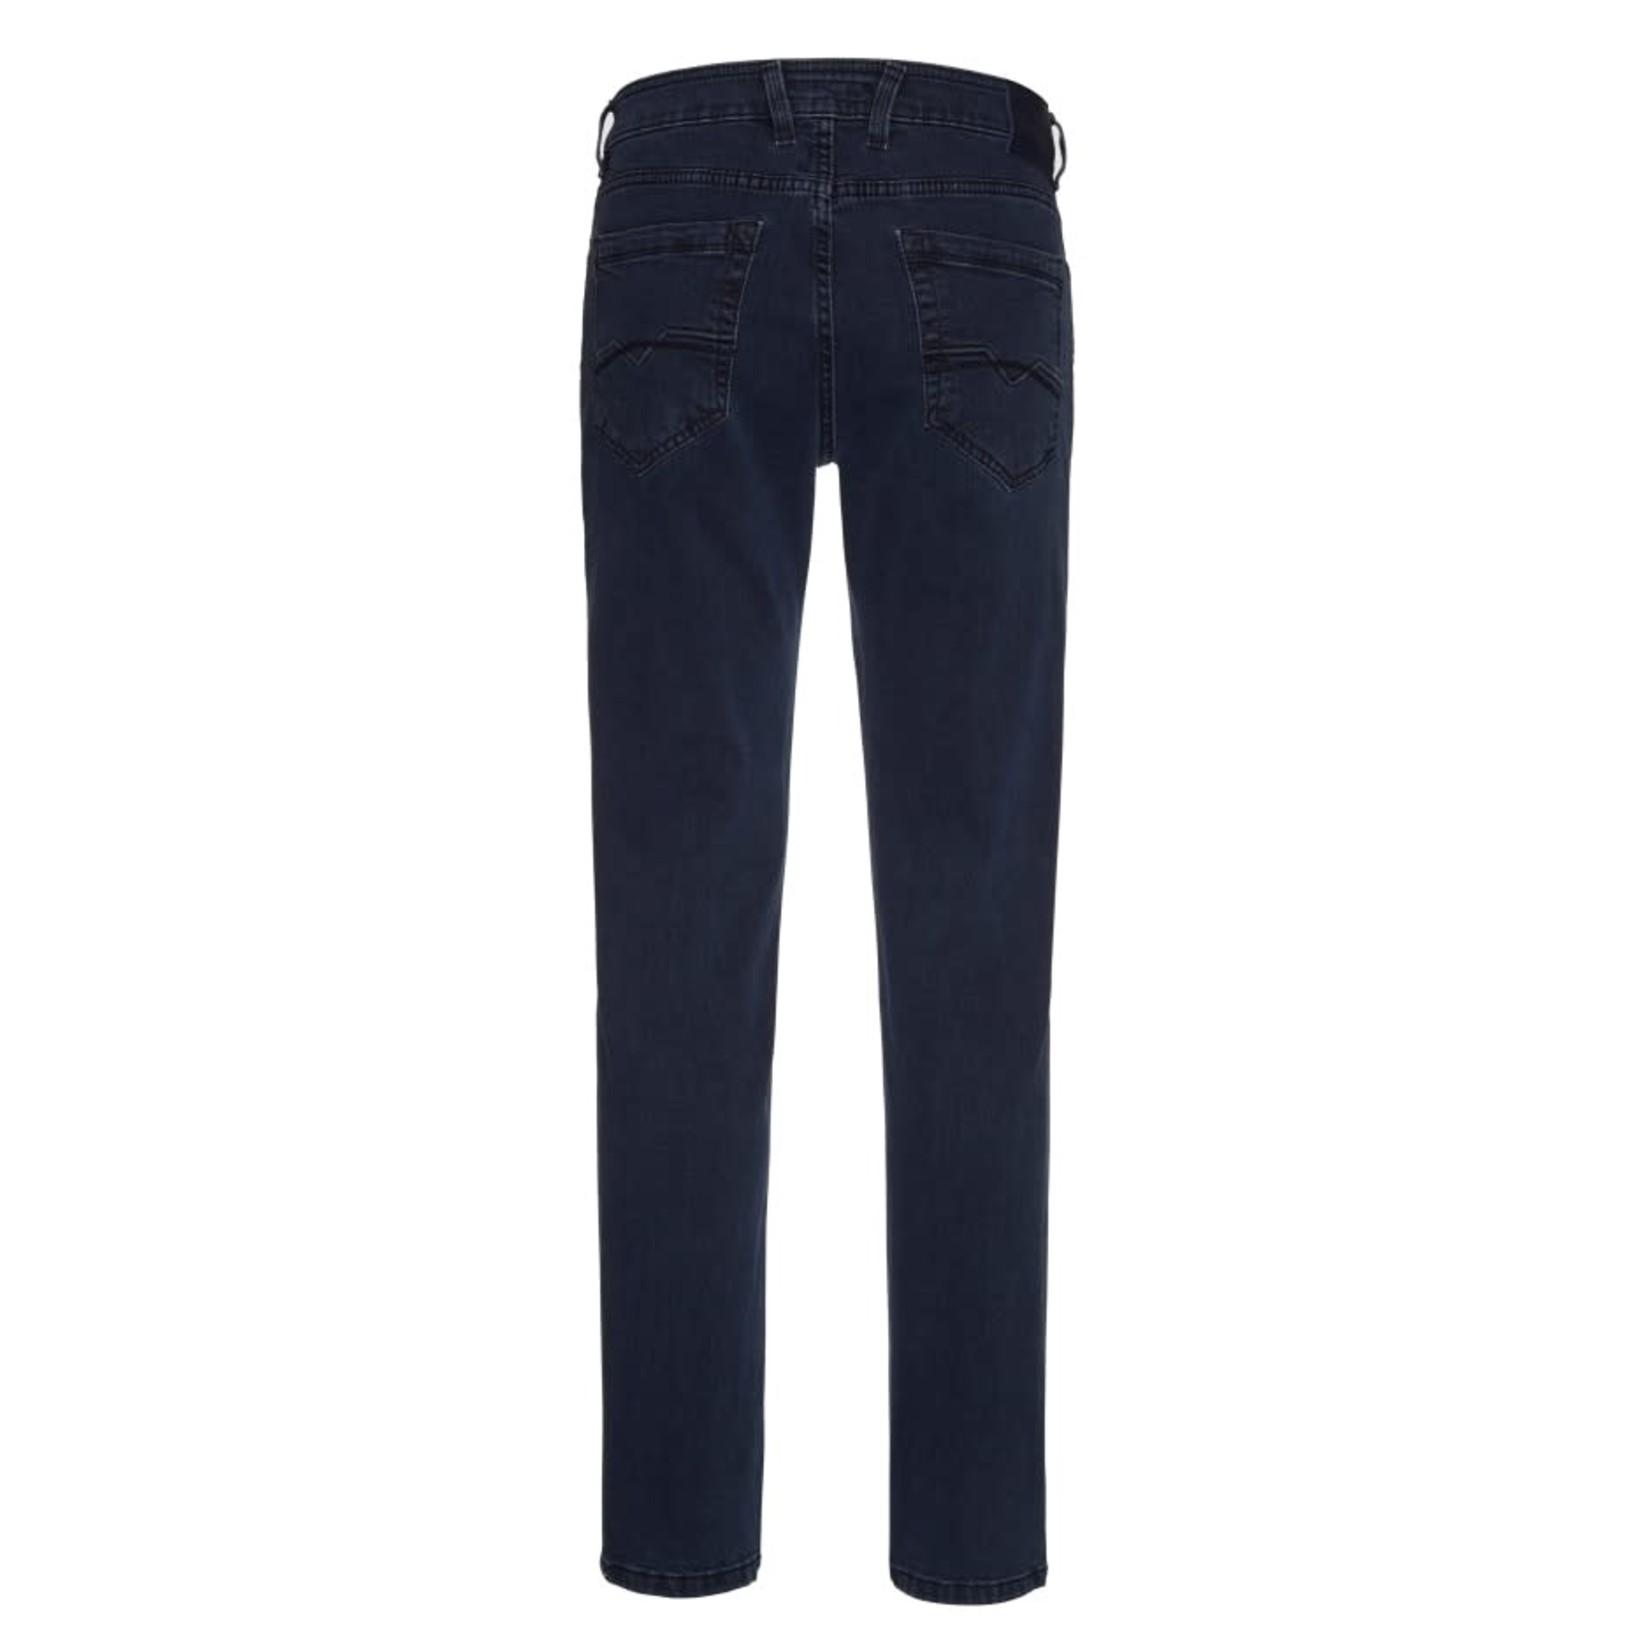 Gardeur Batu-2 modern fit jeans donkerblauw 71001-769